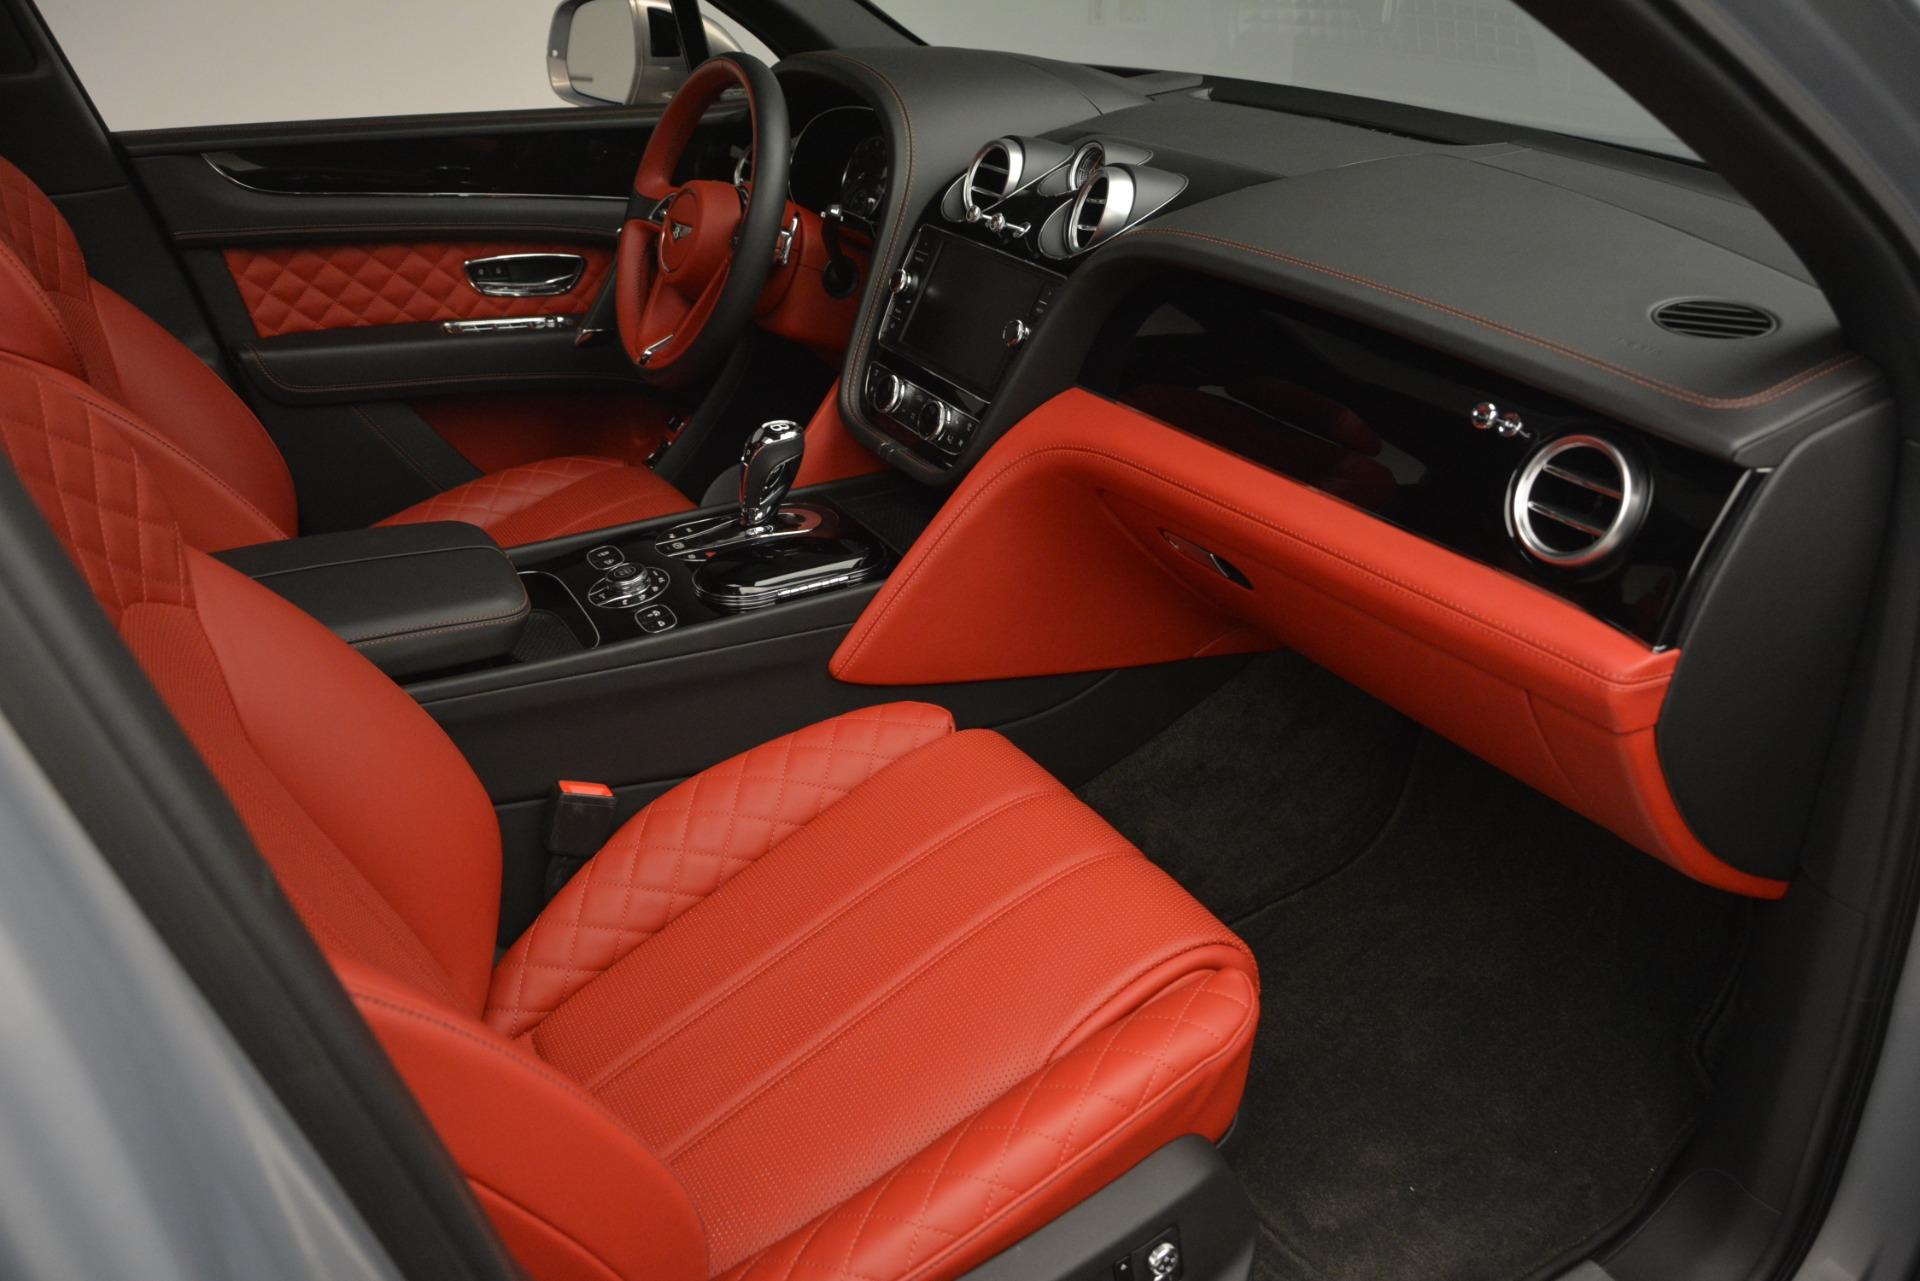 Used 2017 Bentley Bentayga W12 For Sale In Greenwich, CT. Alfa Romeo of Greenwich, 7438 2641_p26